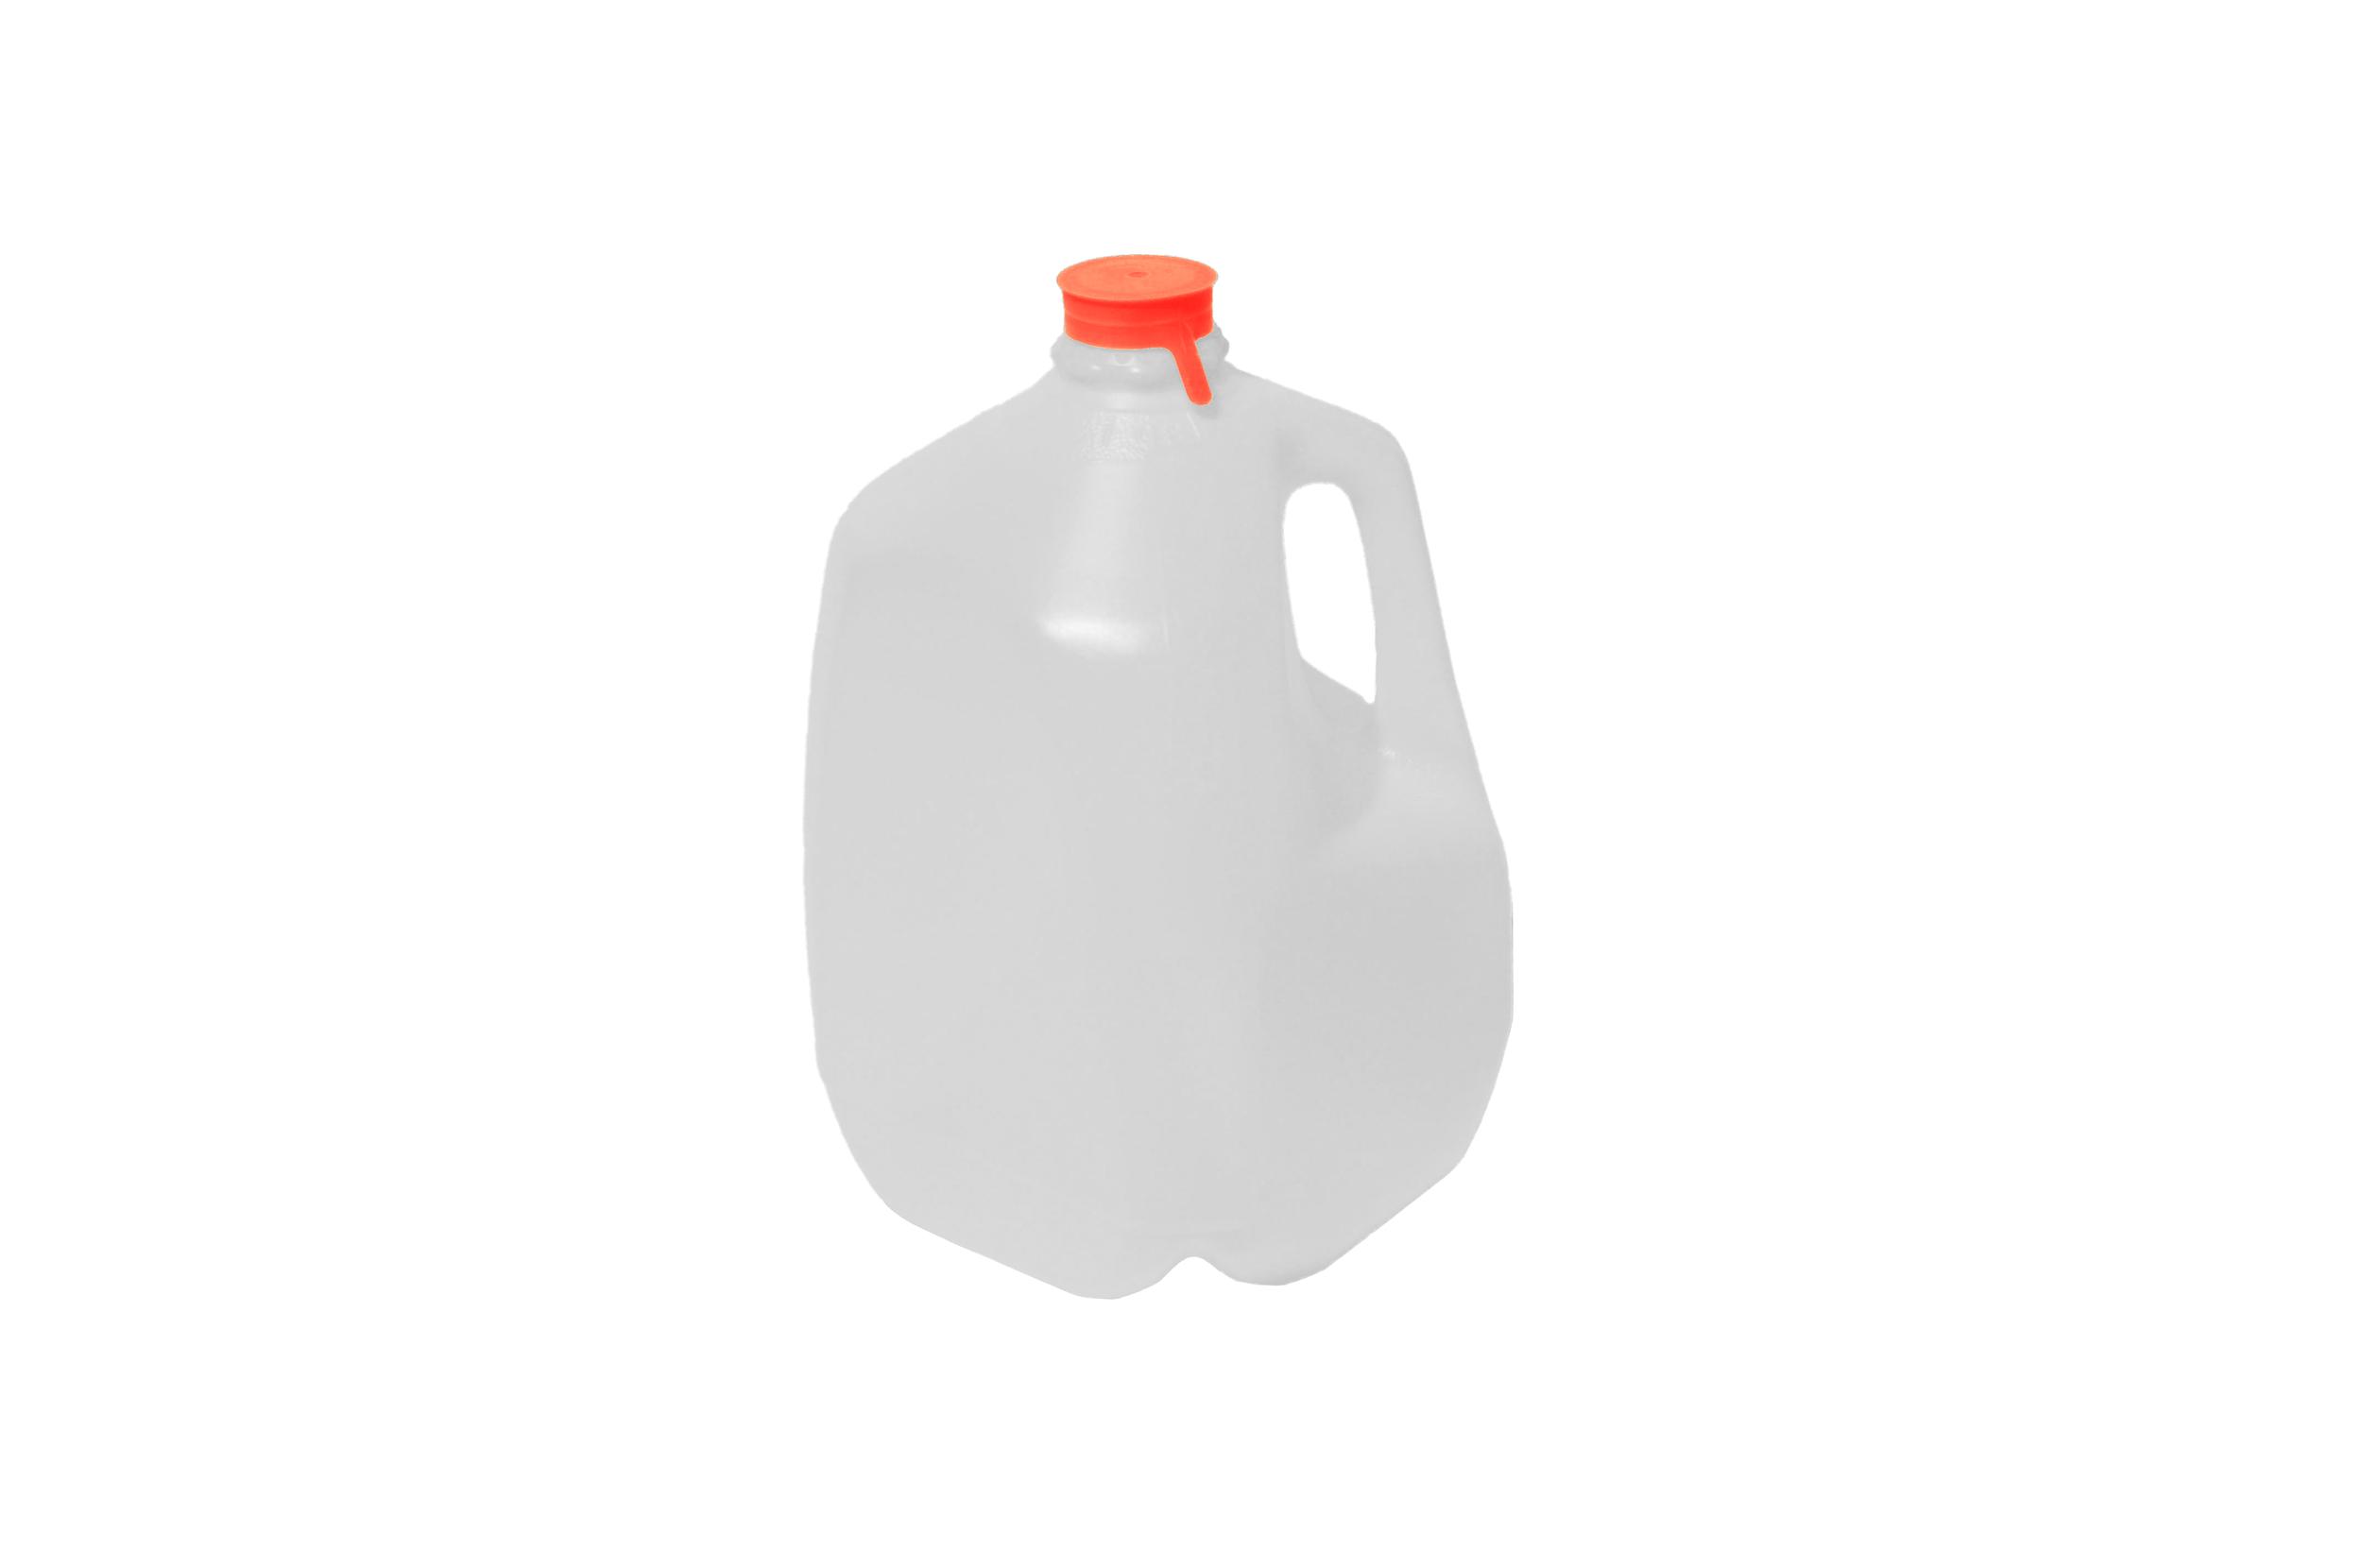 WaterJug_Title_1.png